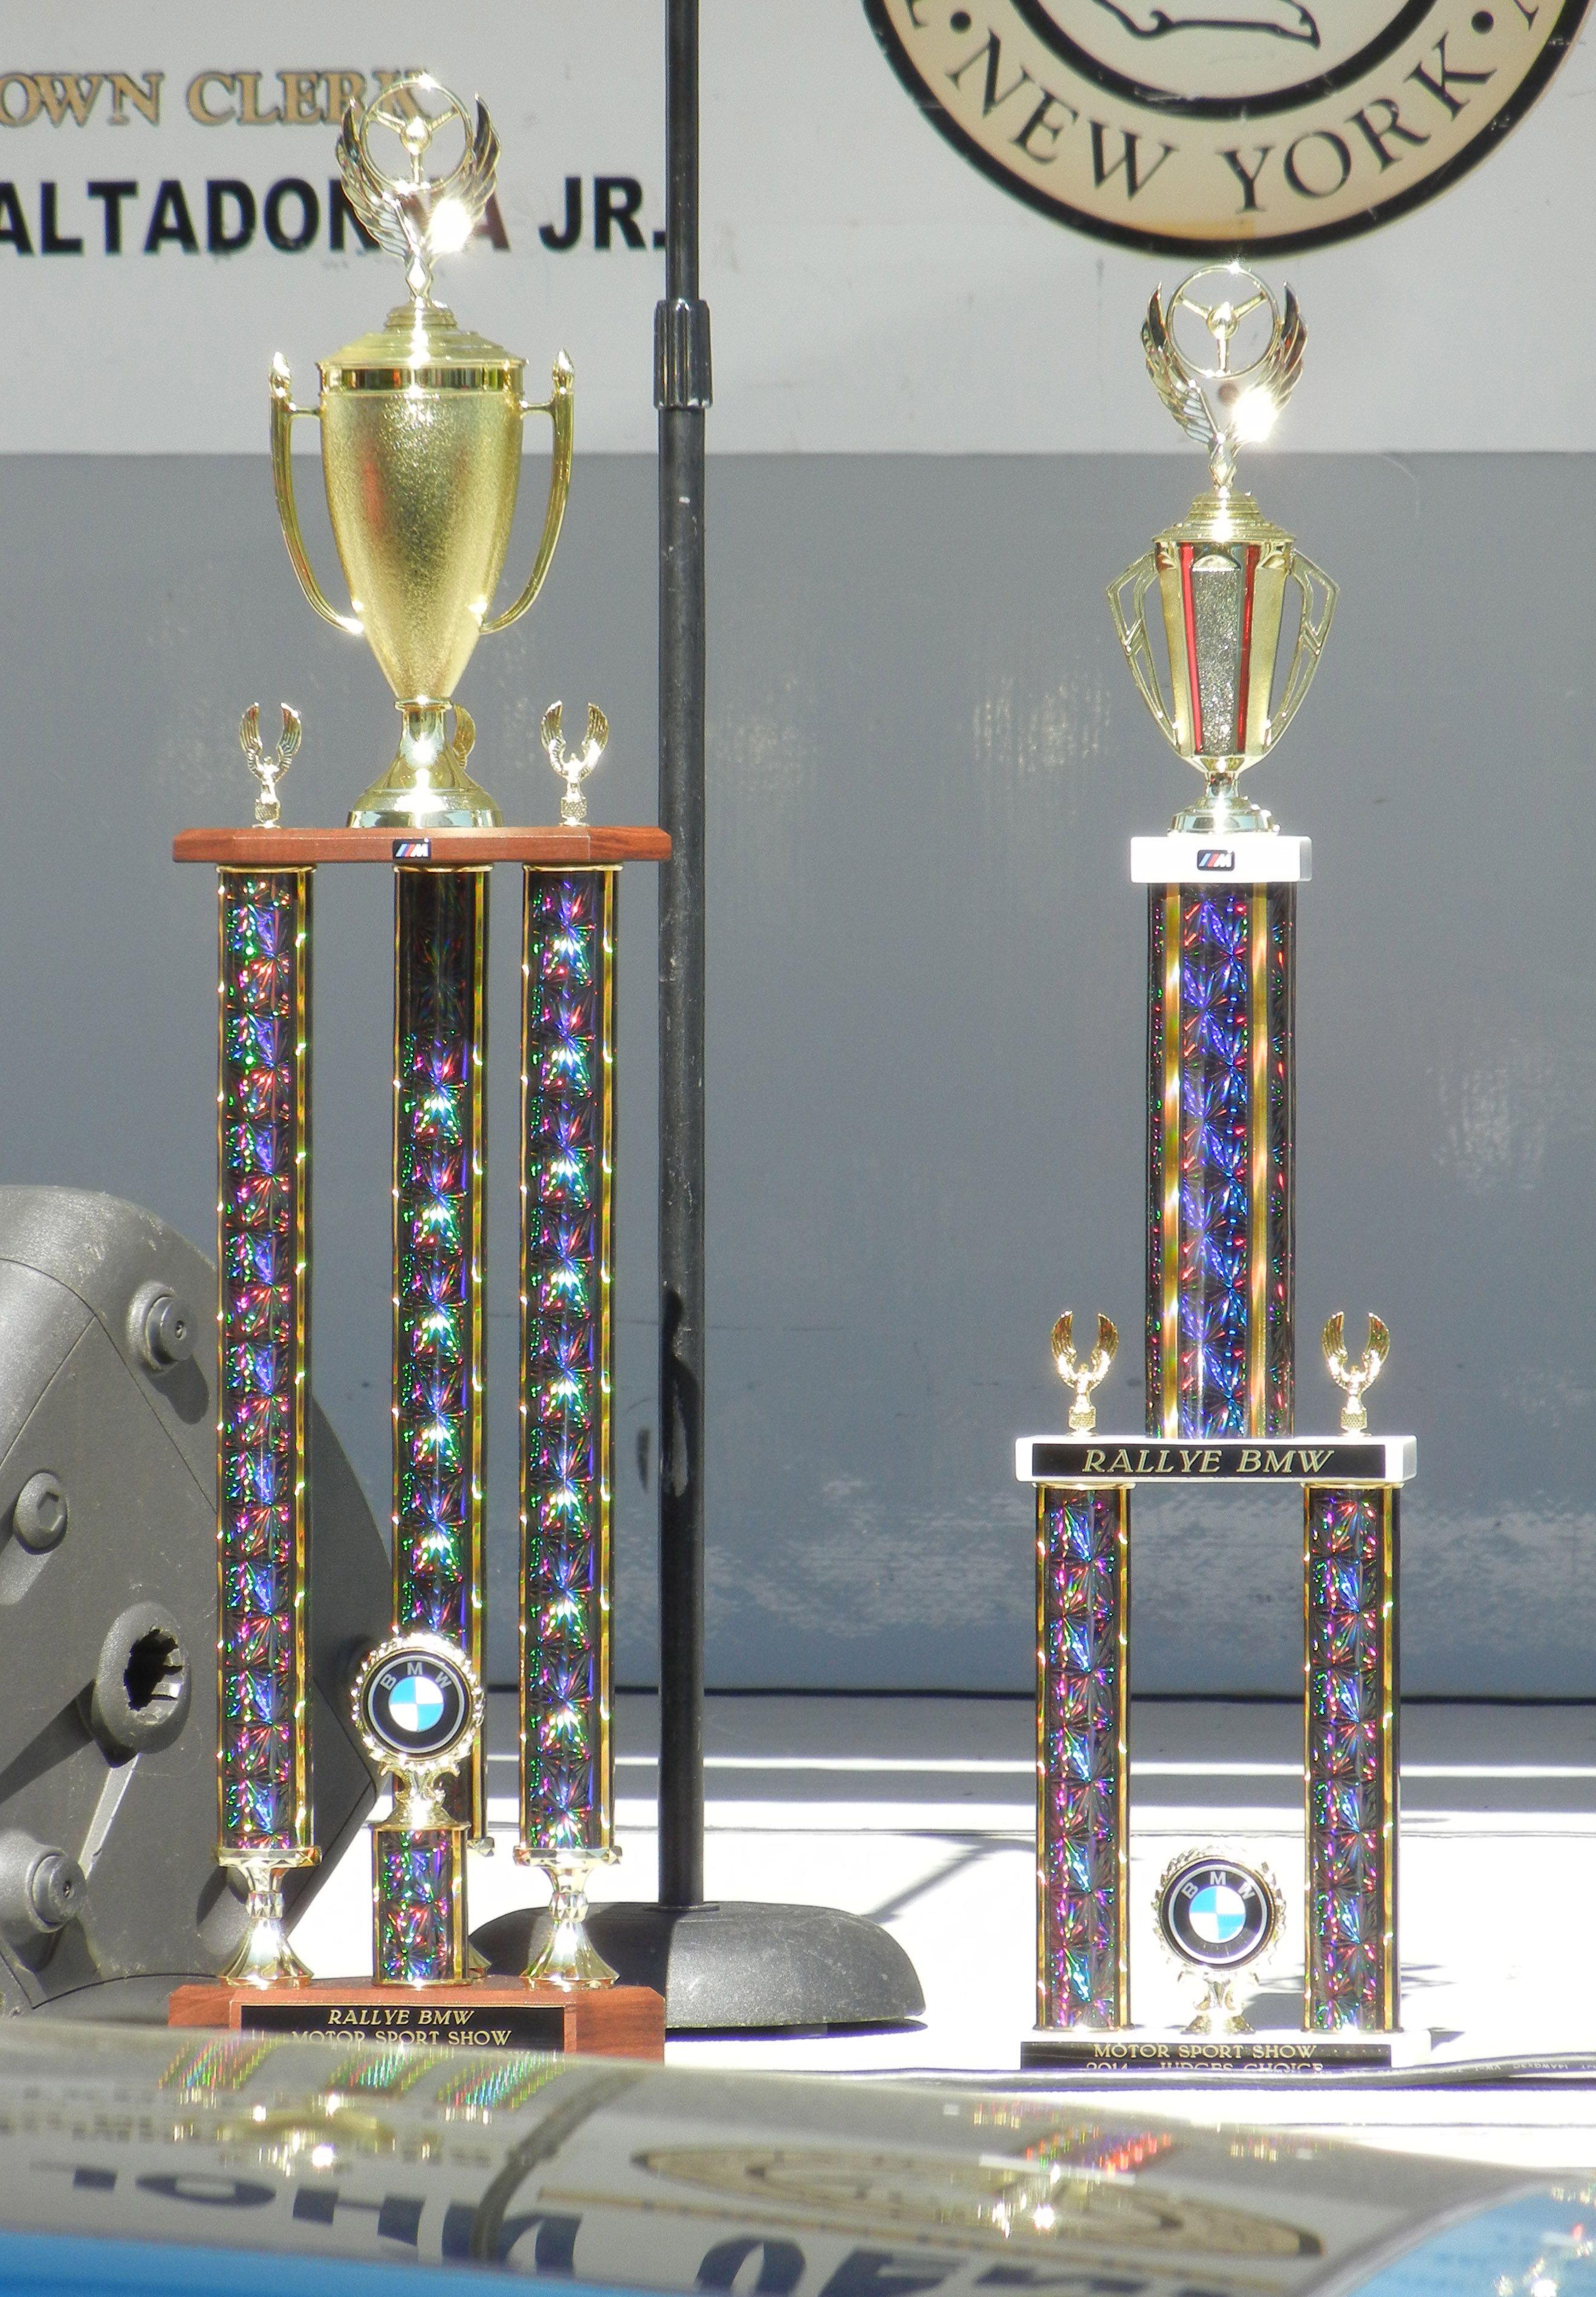 5th annual rallye bmw motorsport show bmw dealer bmw